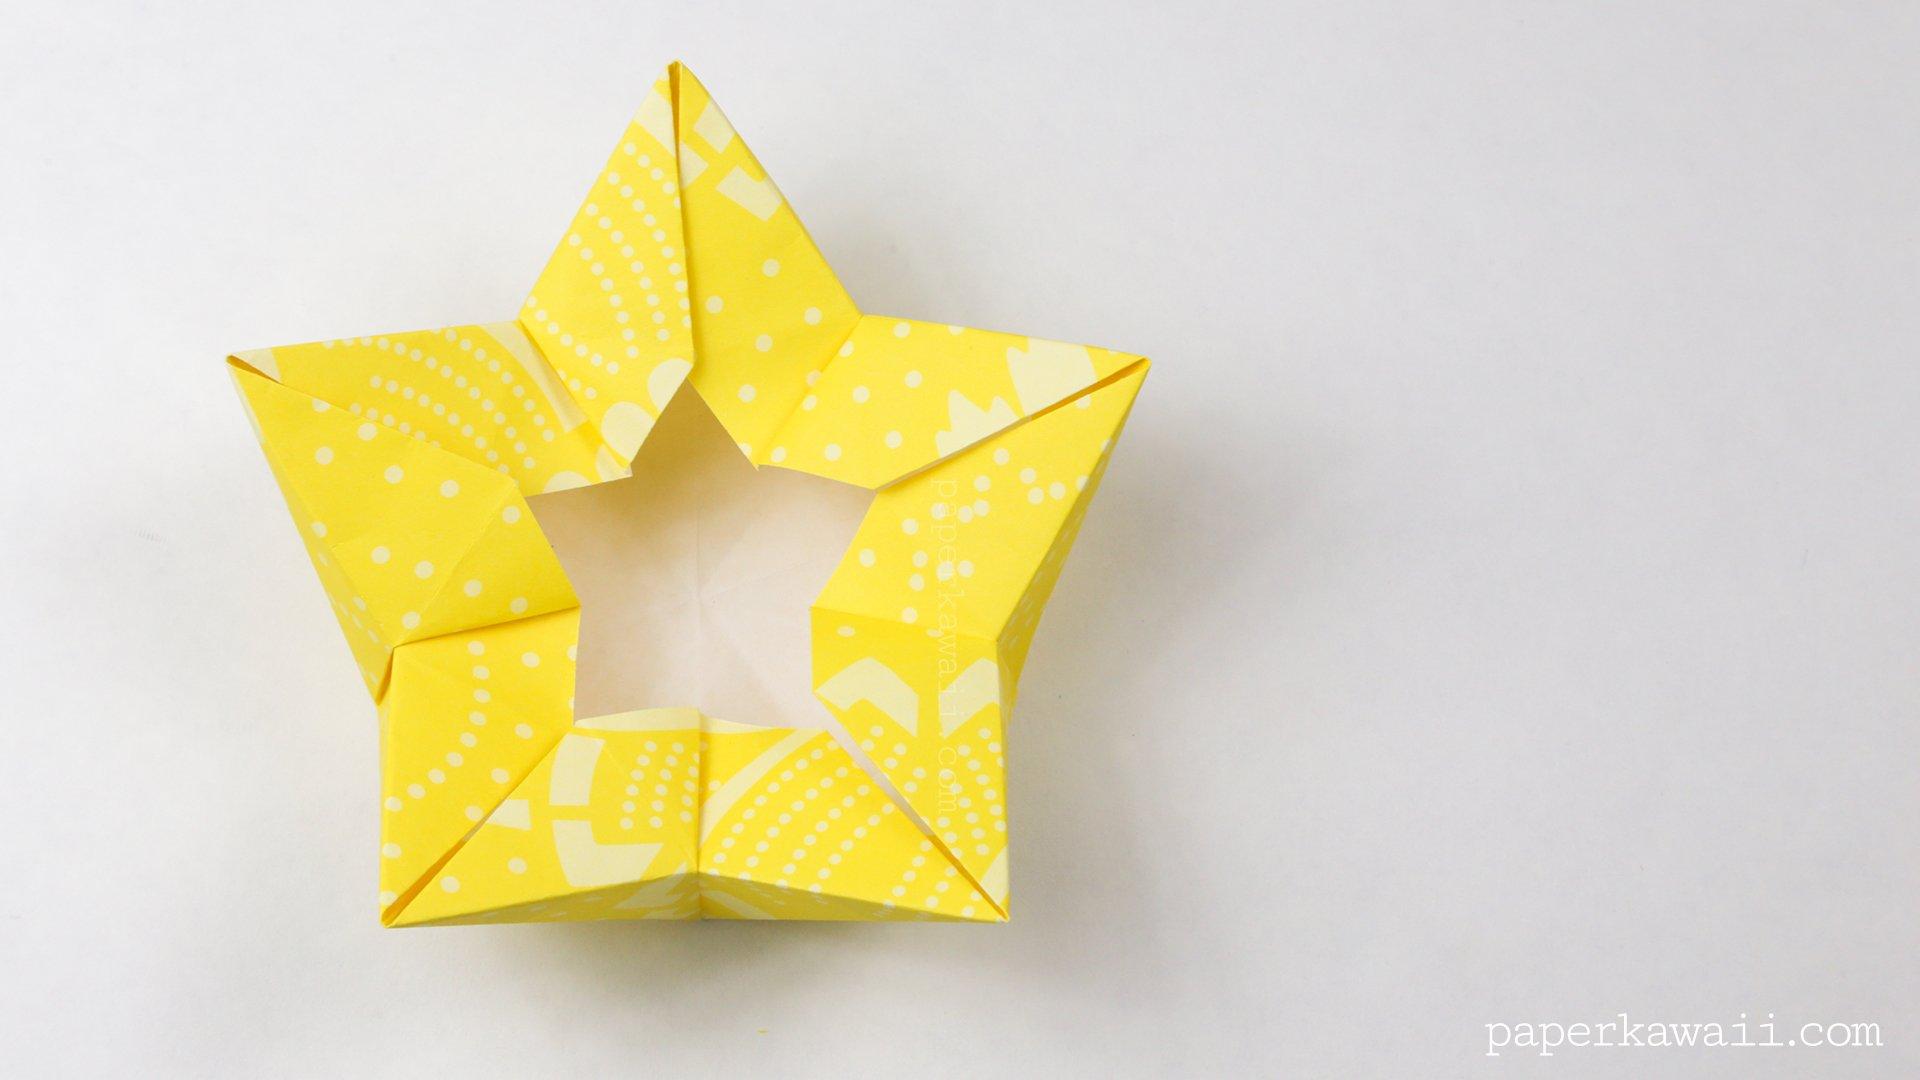 Origami star flower crown bowl tutorial paper kawaii scissors to make the pentagon mightylinksfo Images